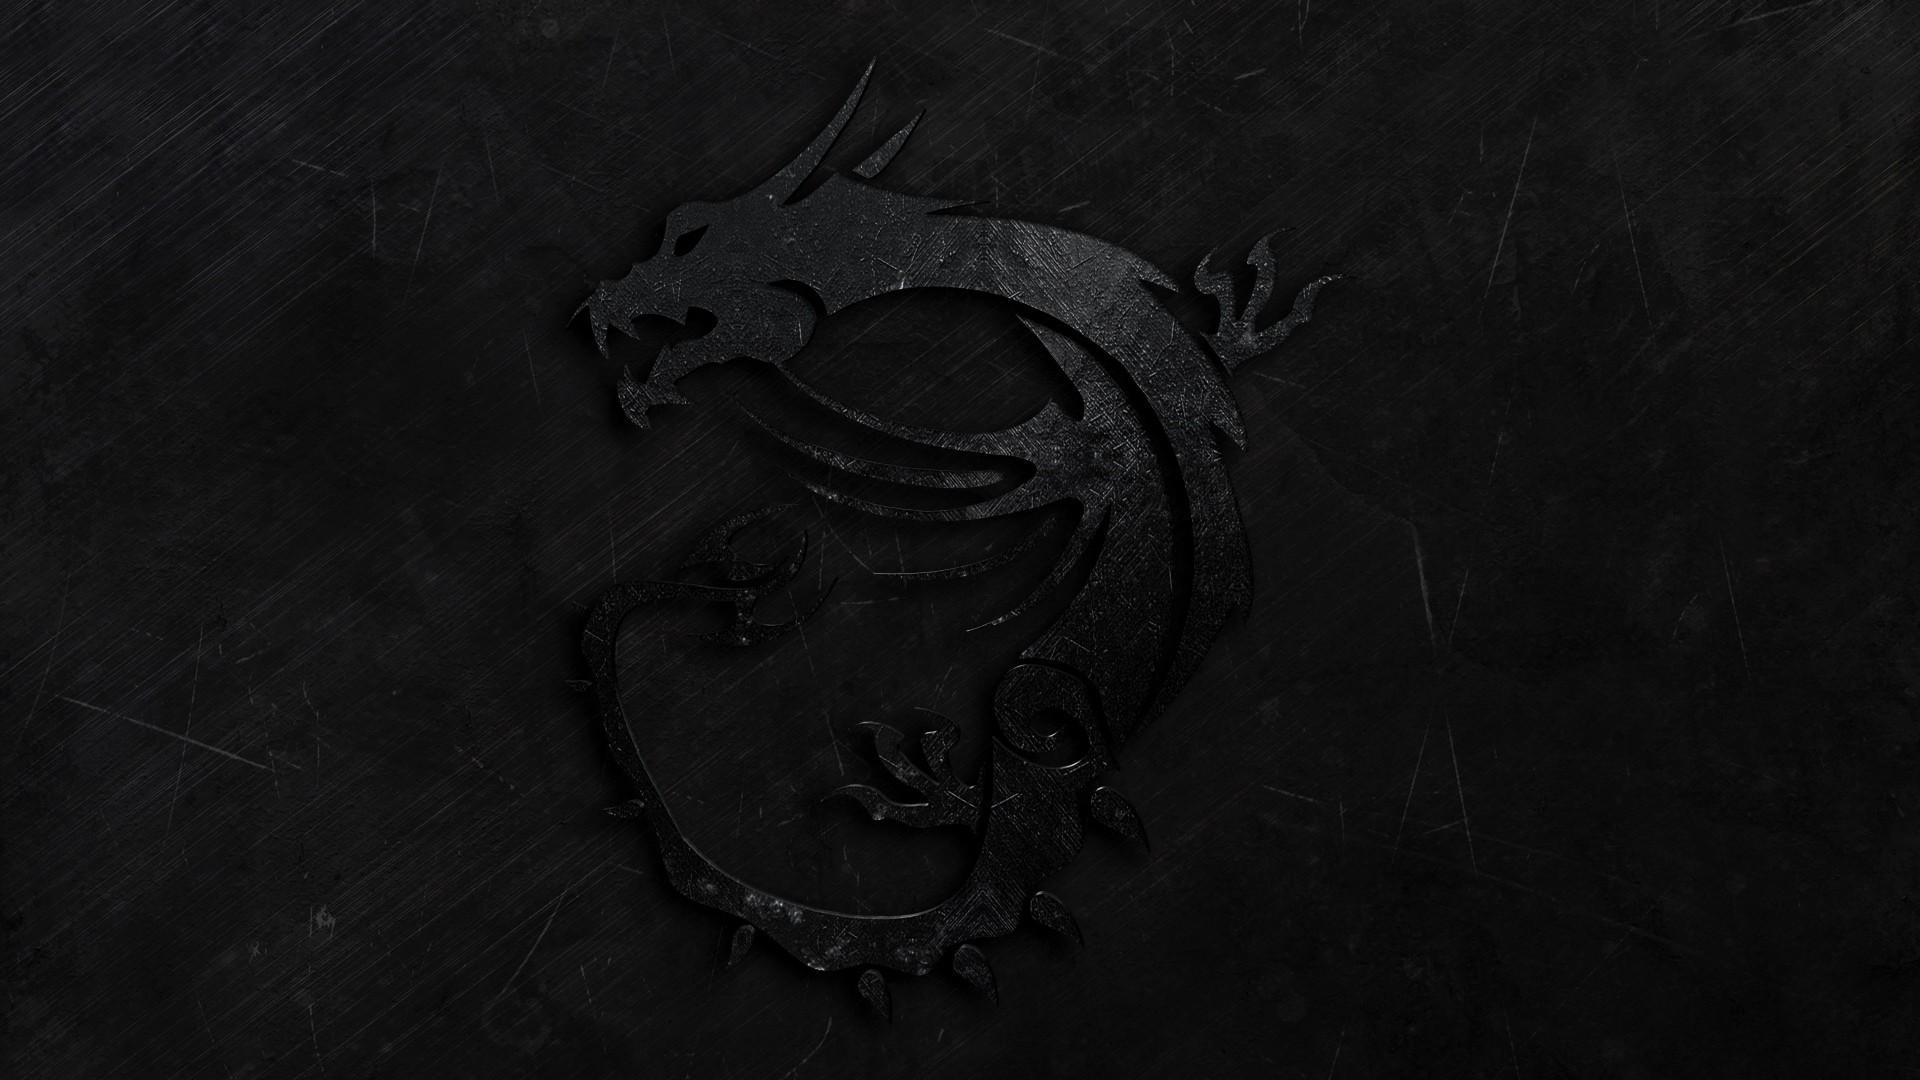 Msi Dragon Wallpaper Hd